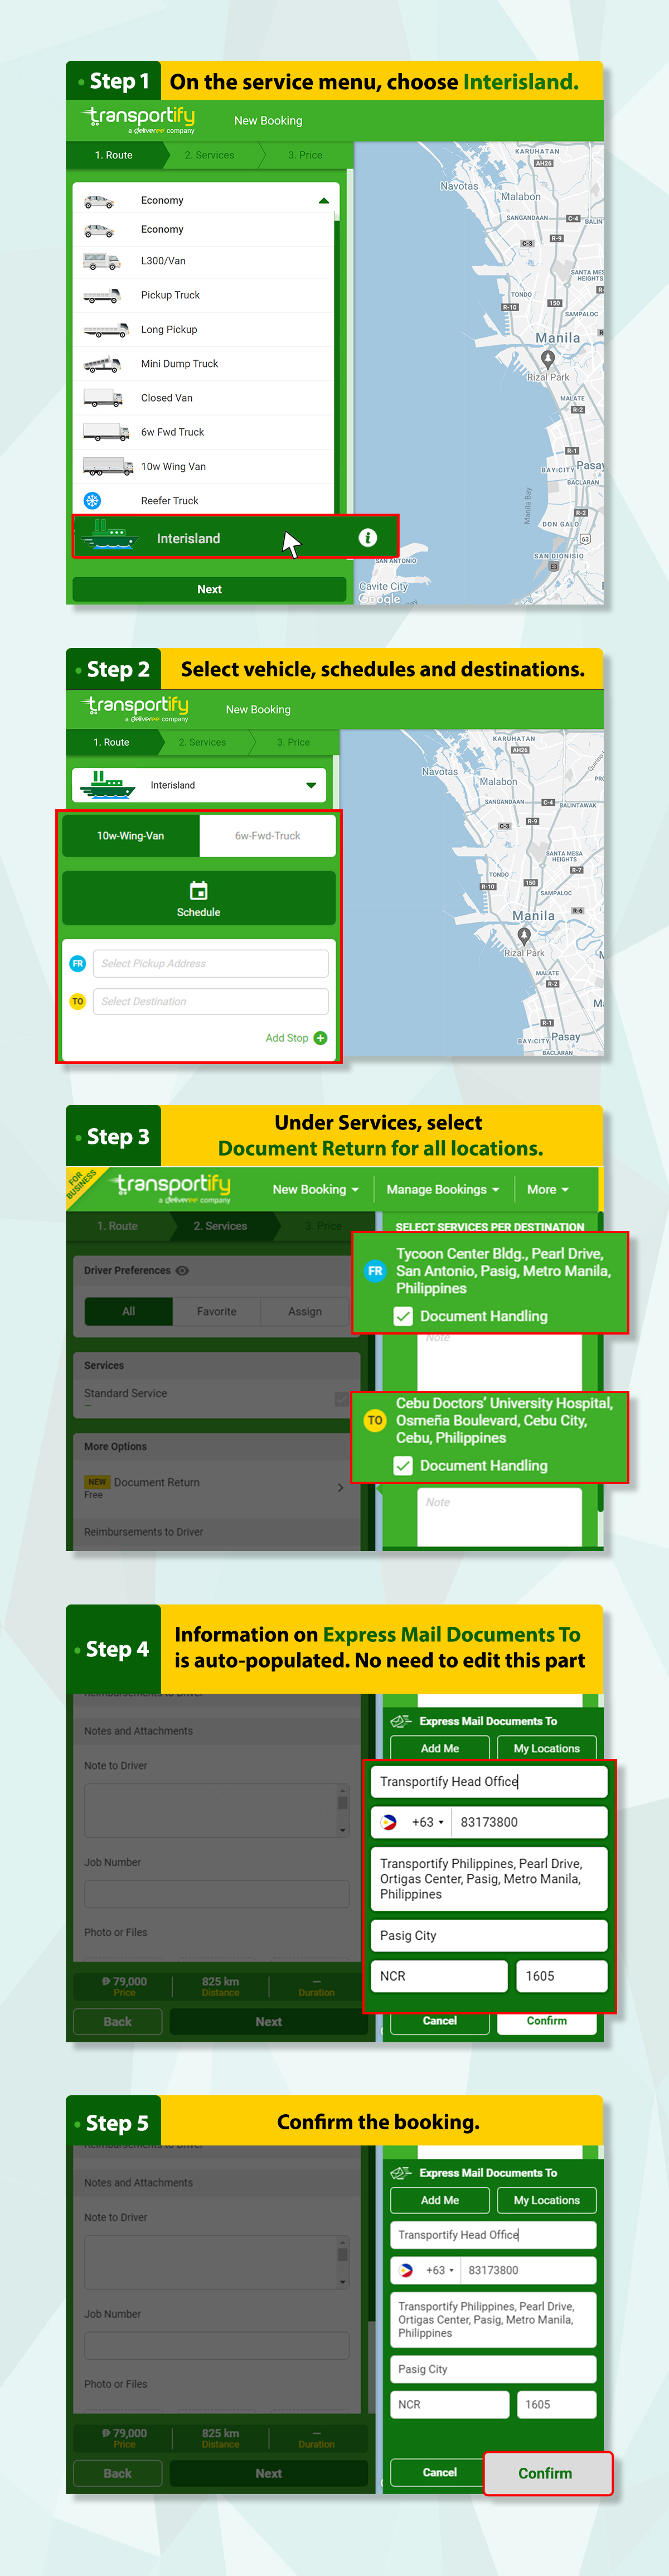 How to Make an Interisland Booking